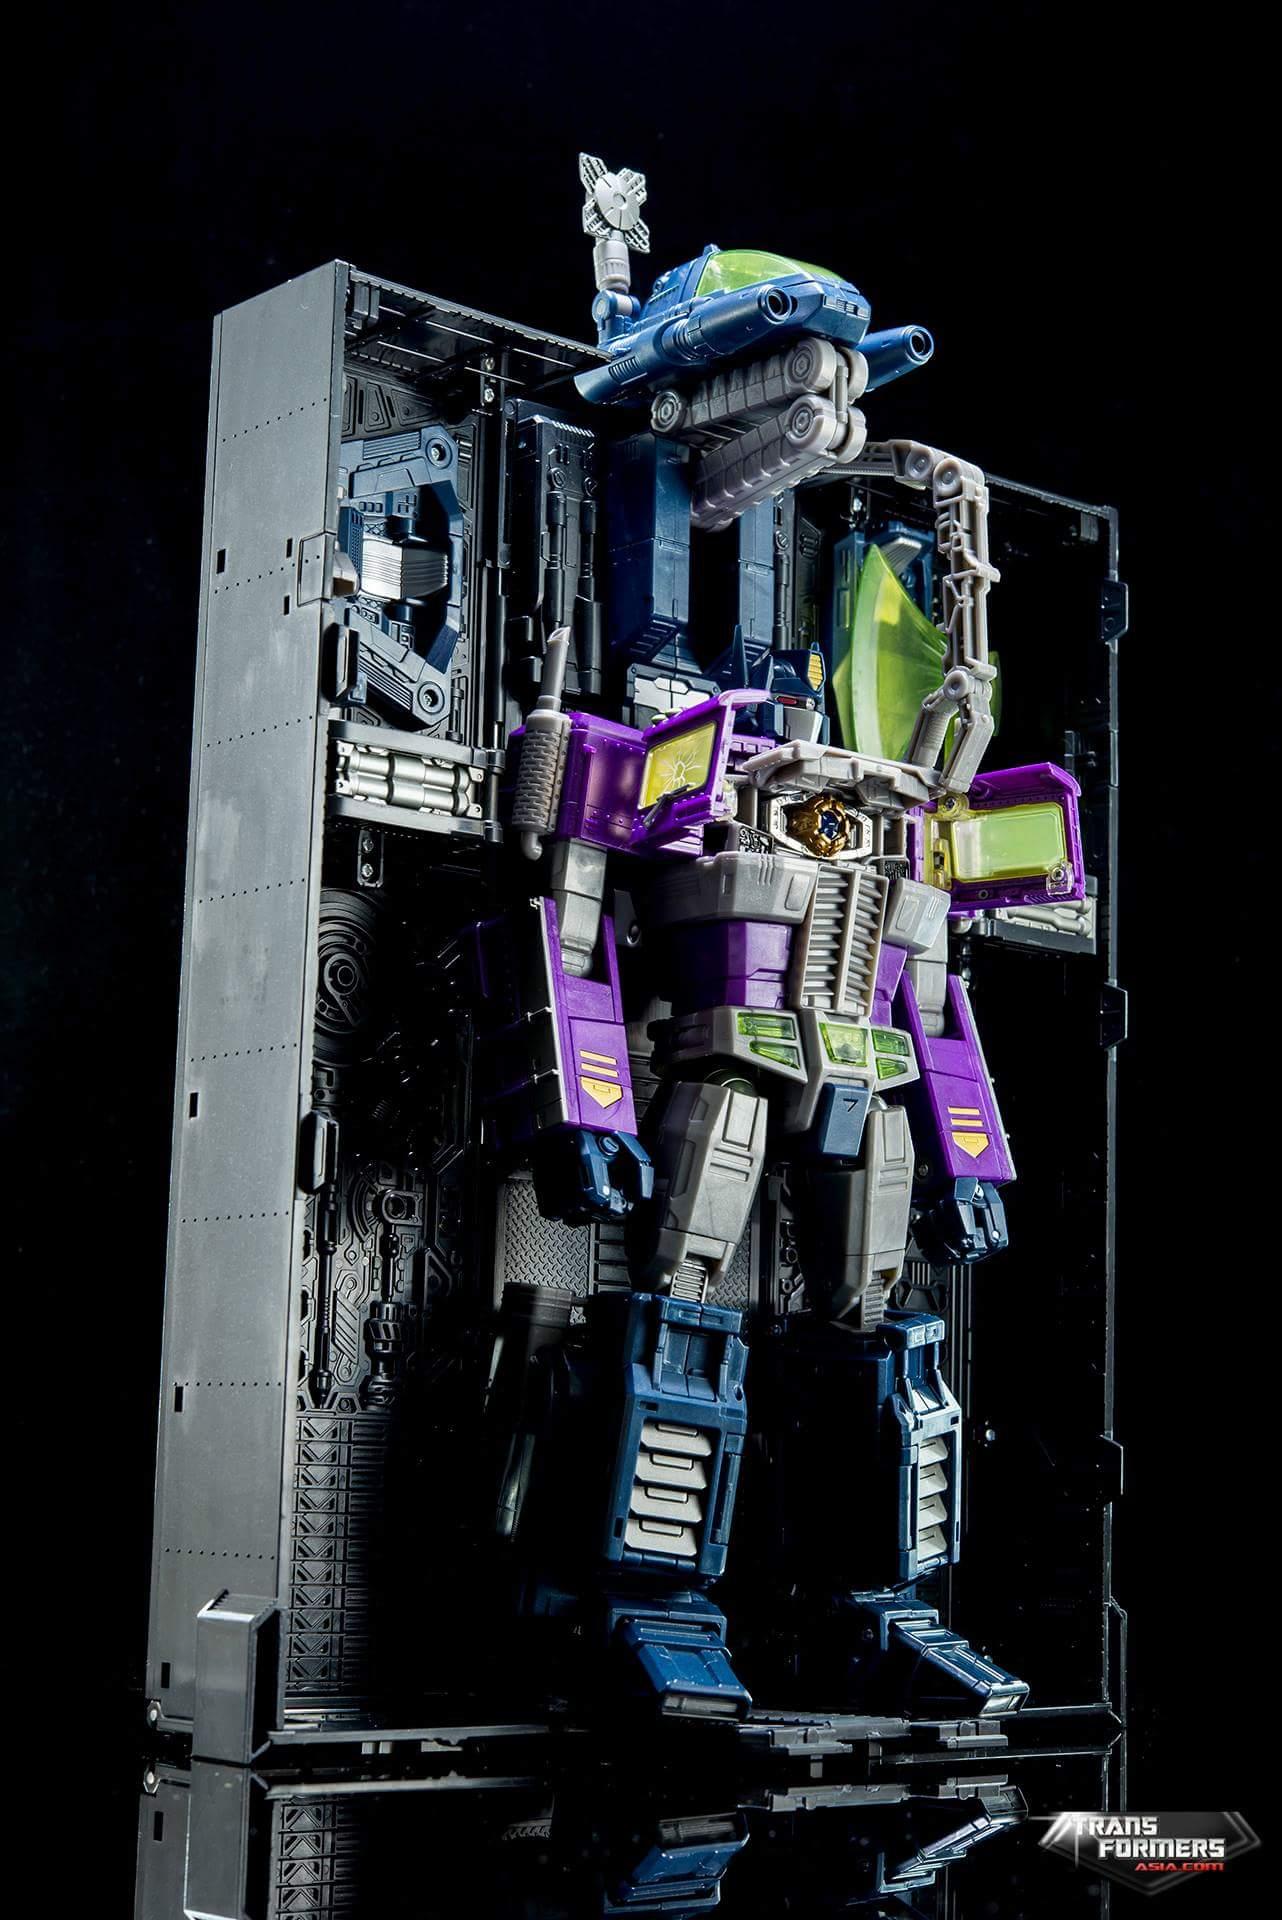 [Masterpiece] MP-10B | MP-10A | MP-10R | MP-10SG | MP-10K | MP-711 | MP-10G | MP-10 ASL ― Convoy (Optimus Prime/Optimus Primus) - Page 4 YHvmn8GR